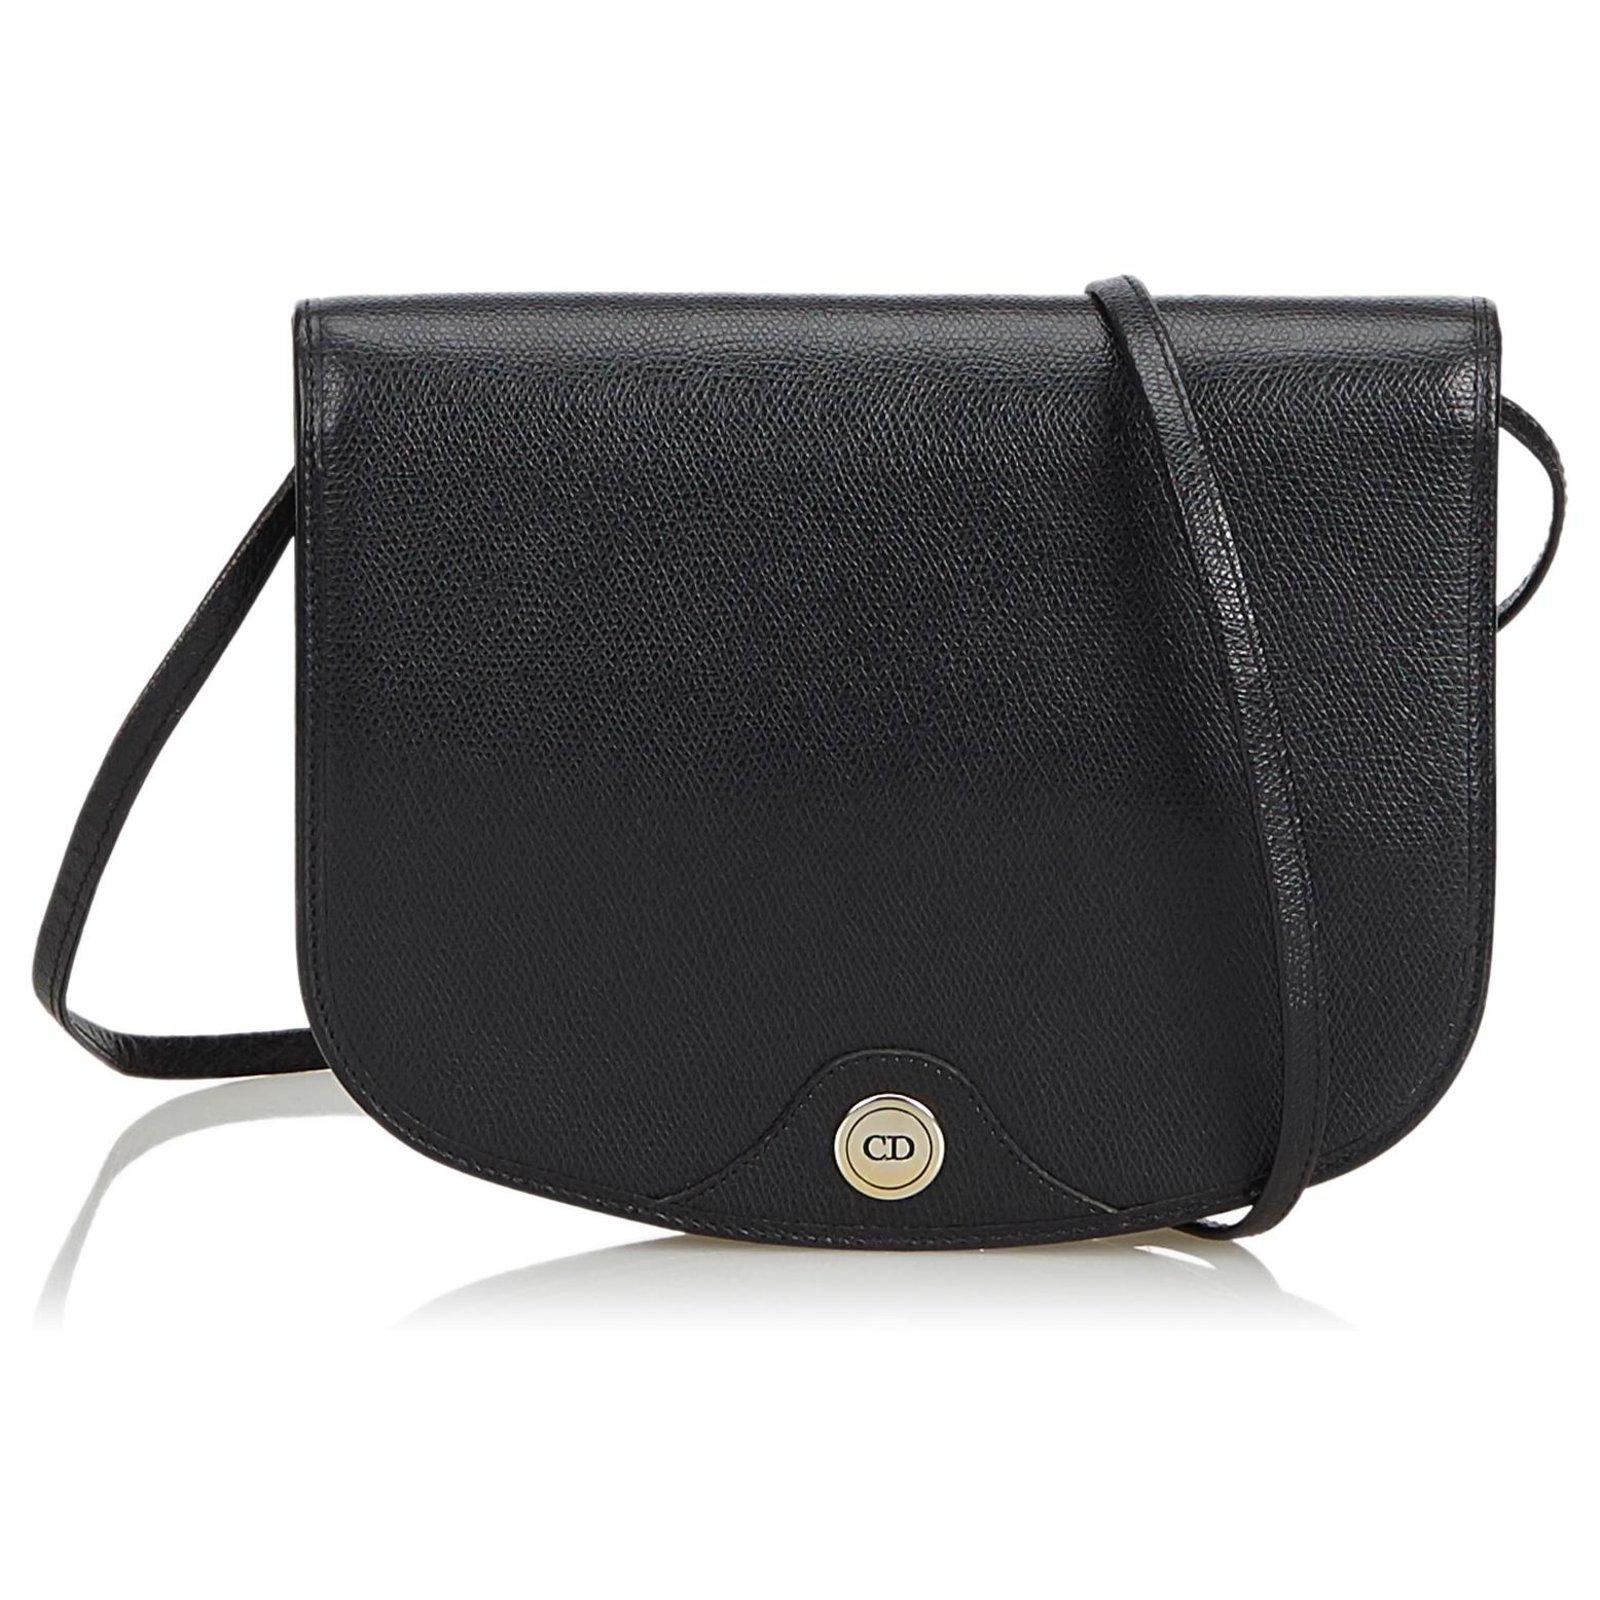 158da7a378 Dior Leather Crossbody Bag Handbags Leather,Other Black ref.116094 ...